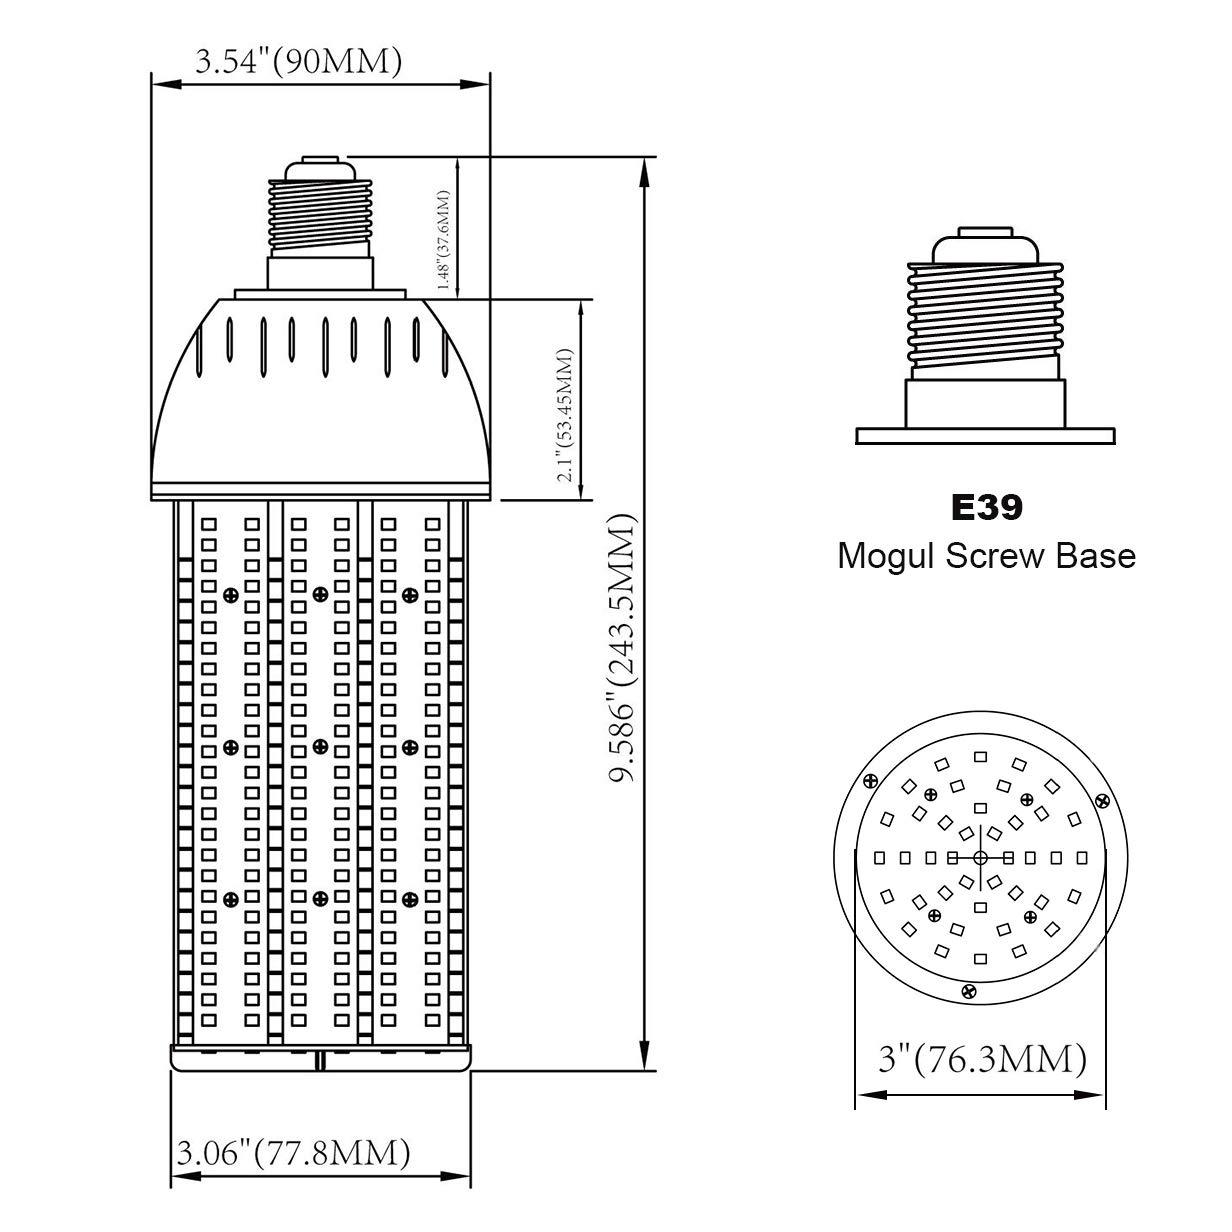 30 Watts LED Corn Light Bulb E26 Medium Base 5,000K Daylight Retrofit Conventional Halogen Compact Fluorescent Low Bay Barn Porch Backyard Floodlight Area Fixture UL Listed